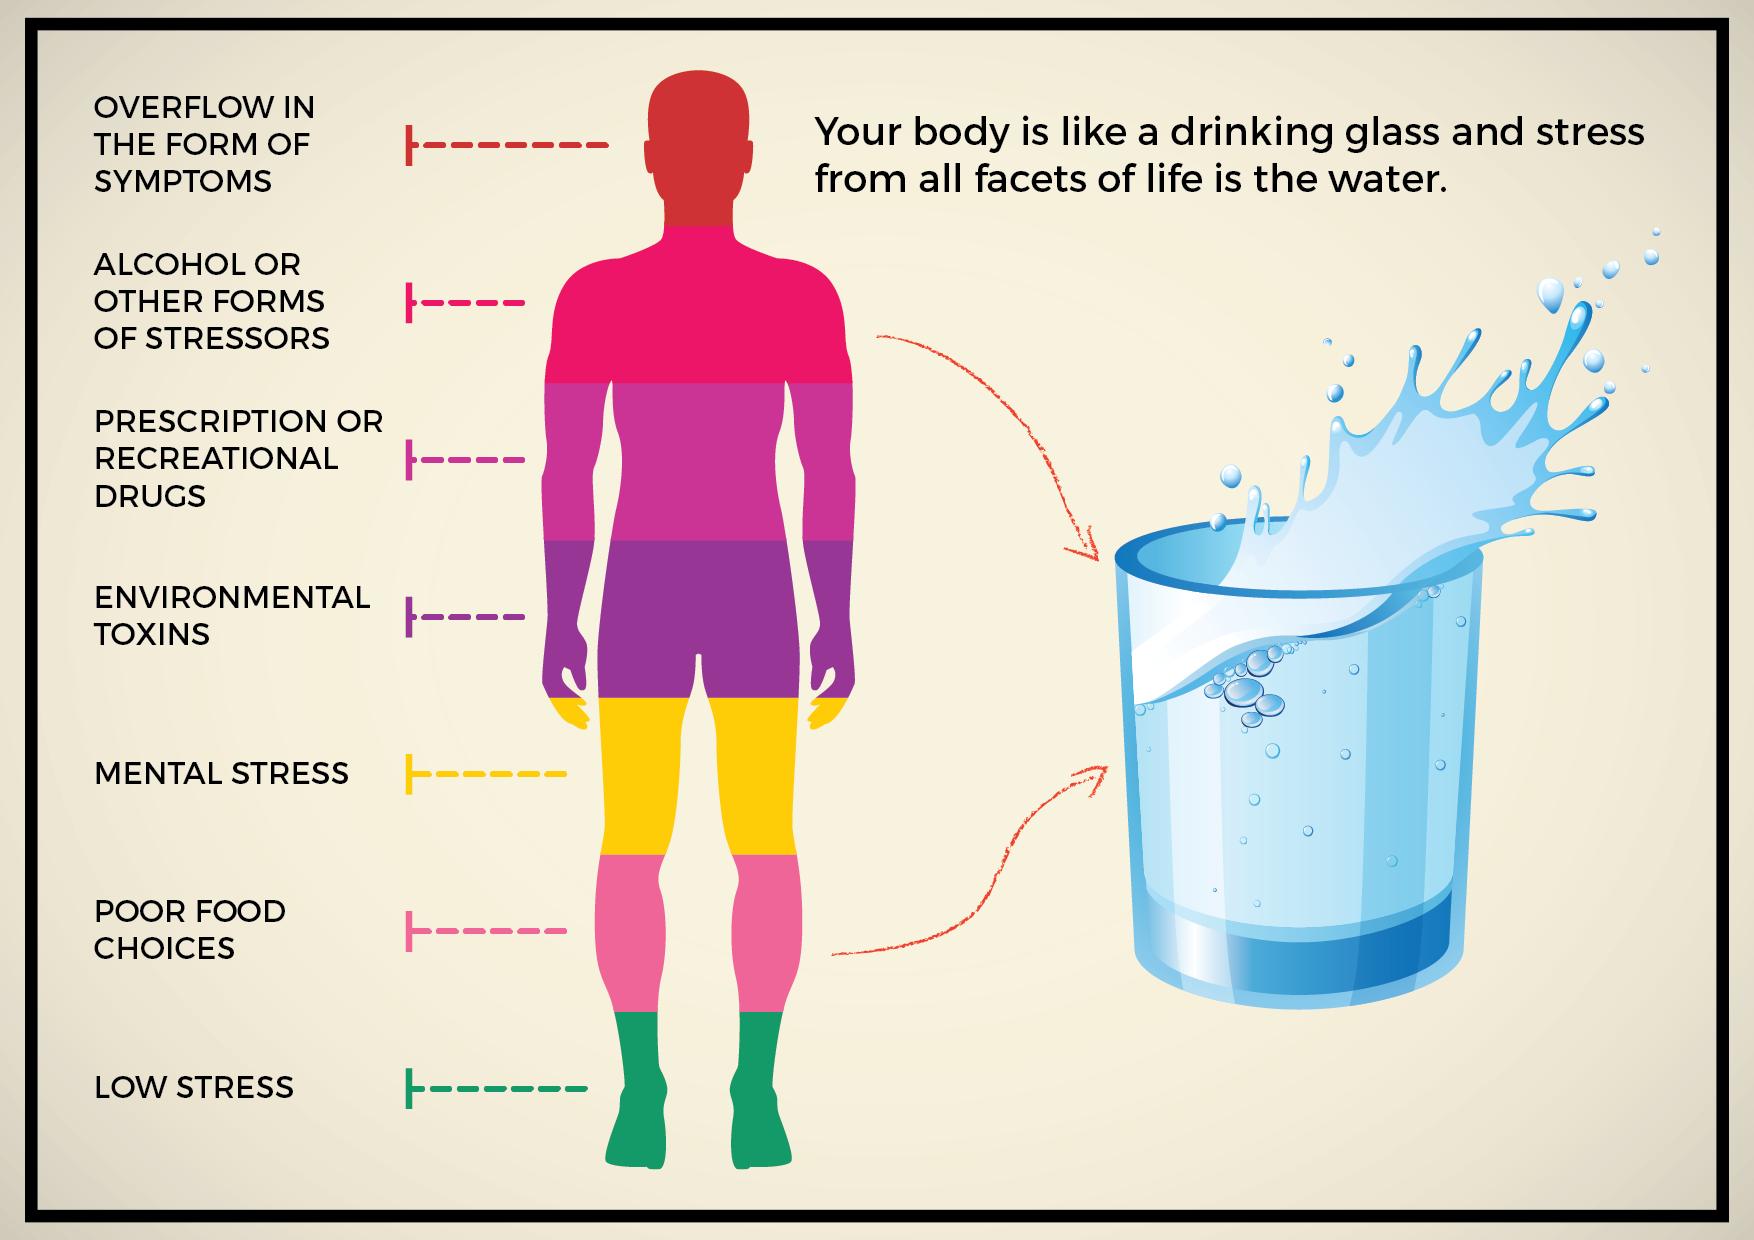 Stress Water Glass Image